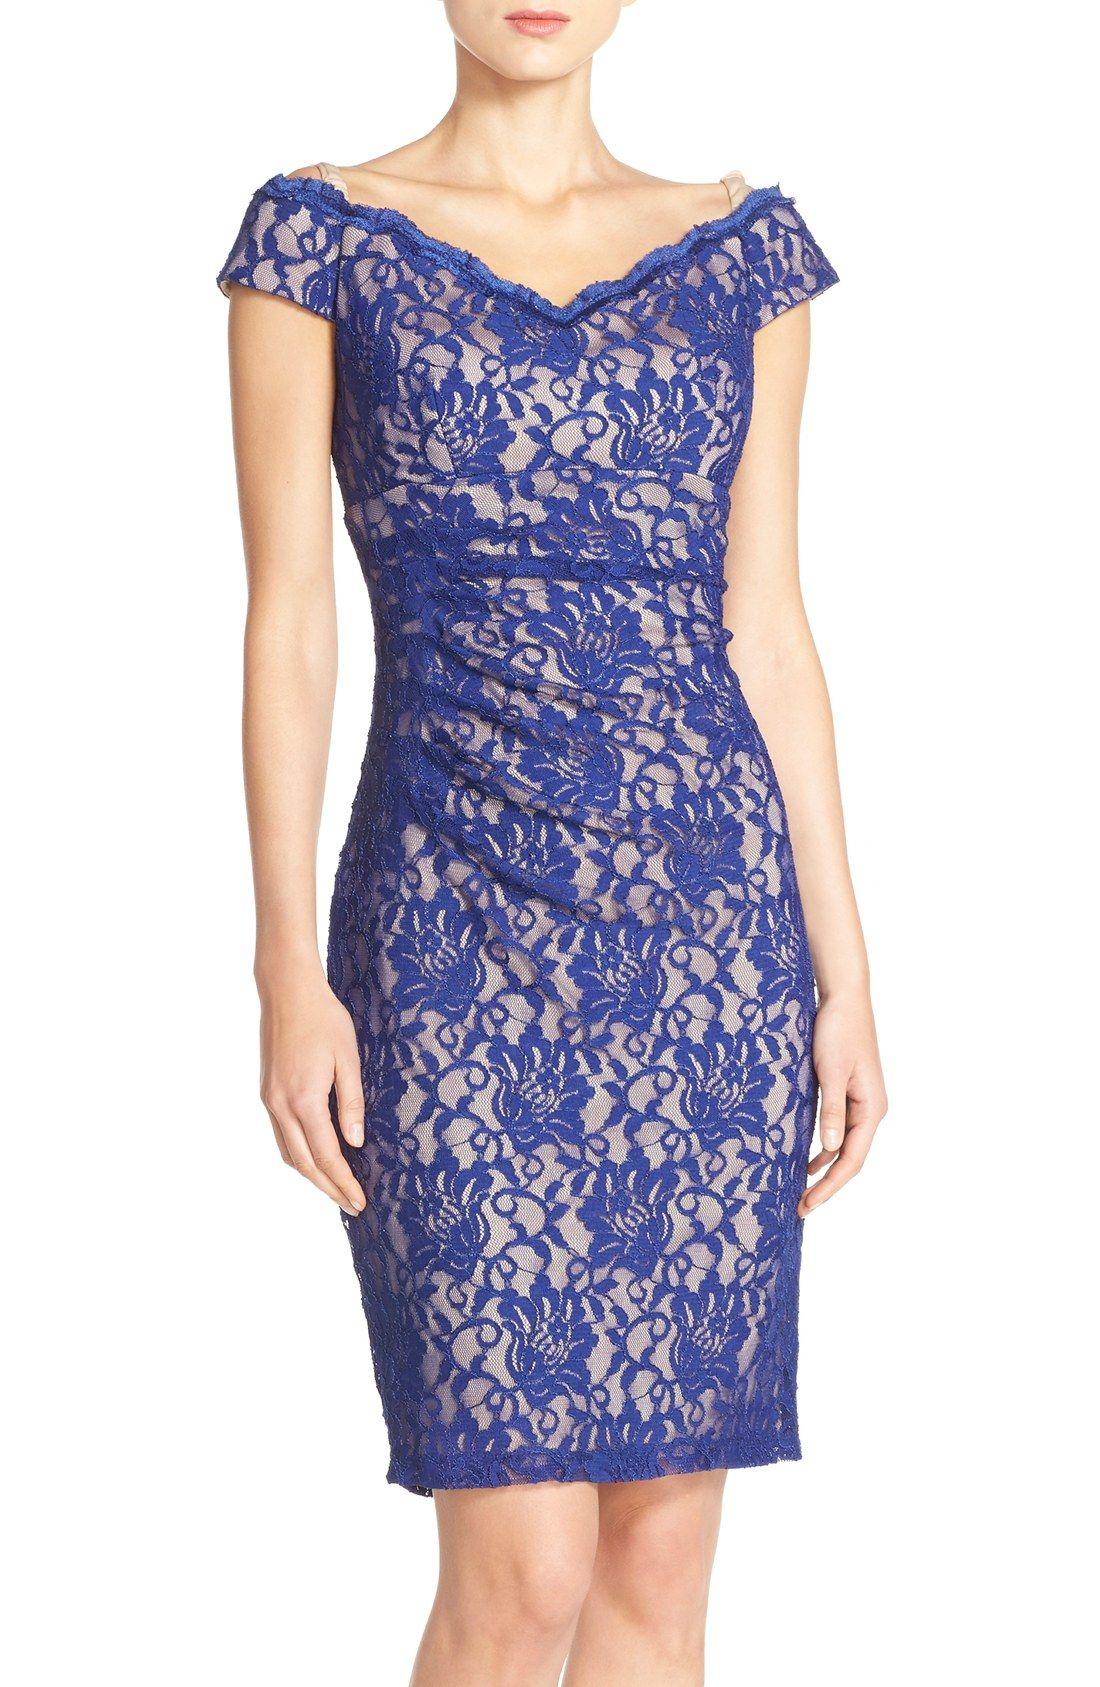 Xscape Off the Shoulder Lace Sheath Dress | pattern 2, the pencil ...